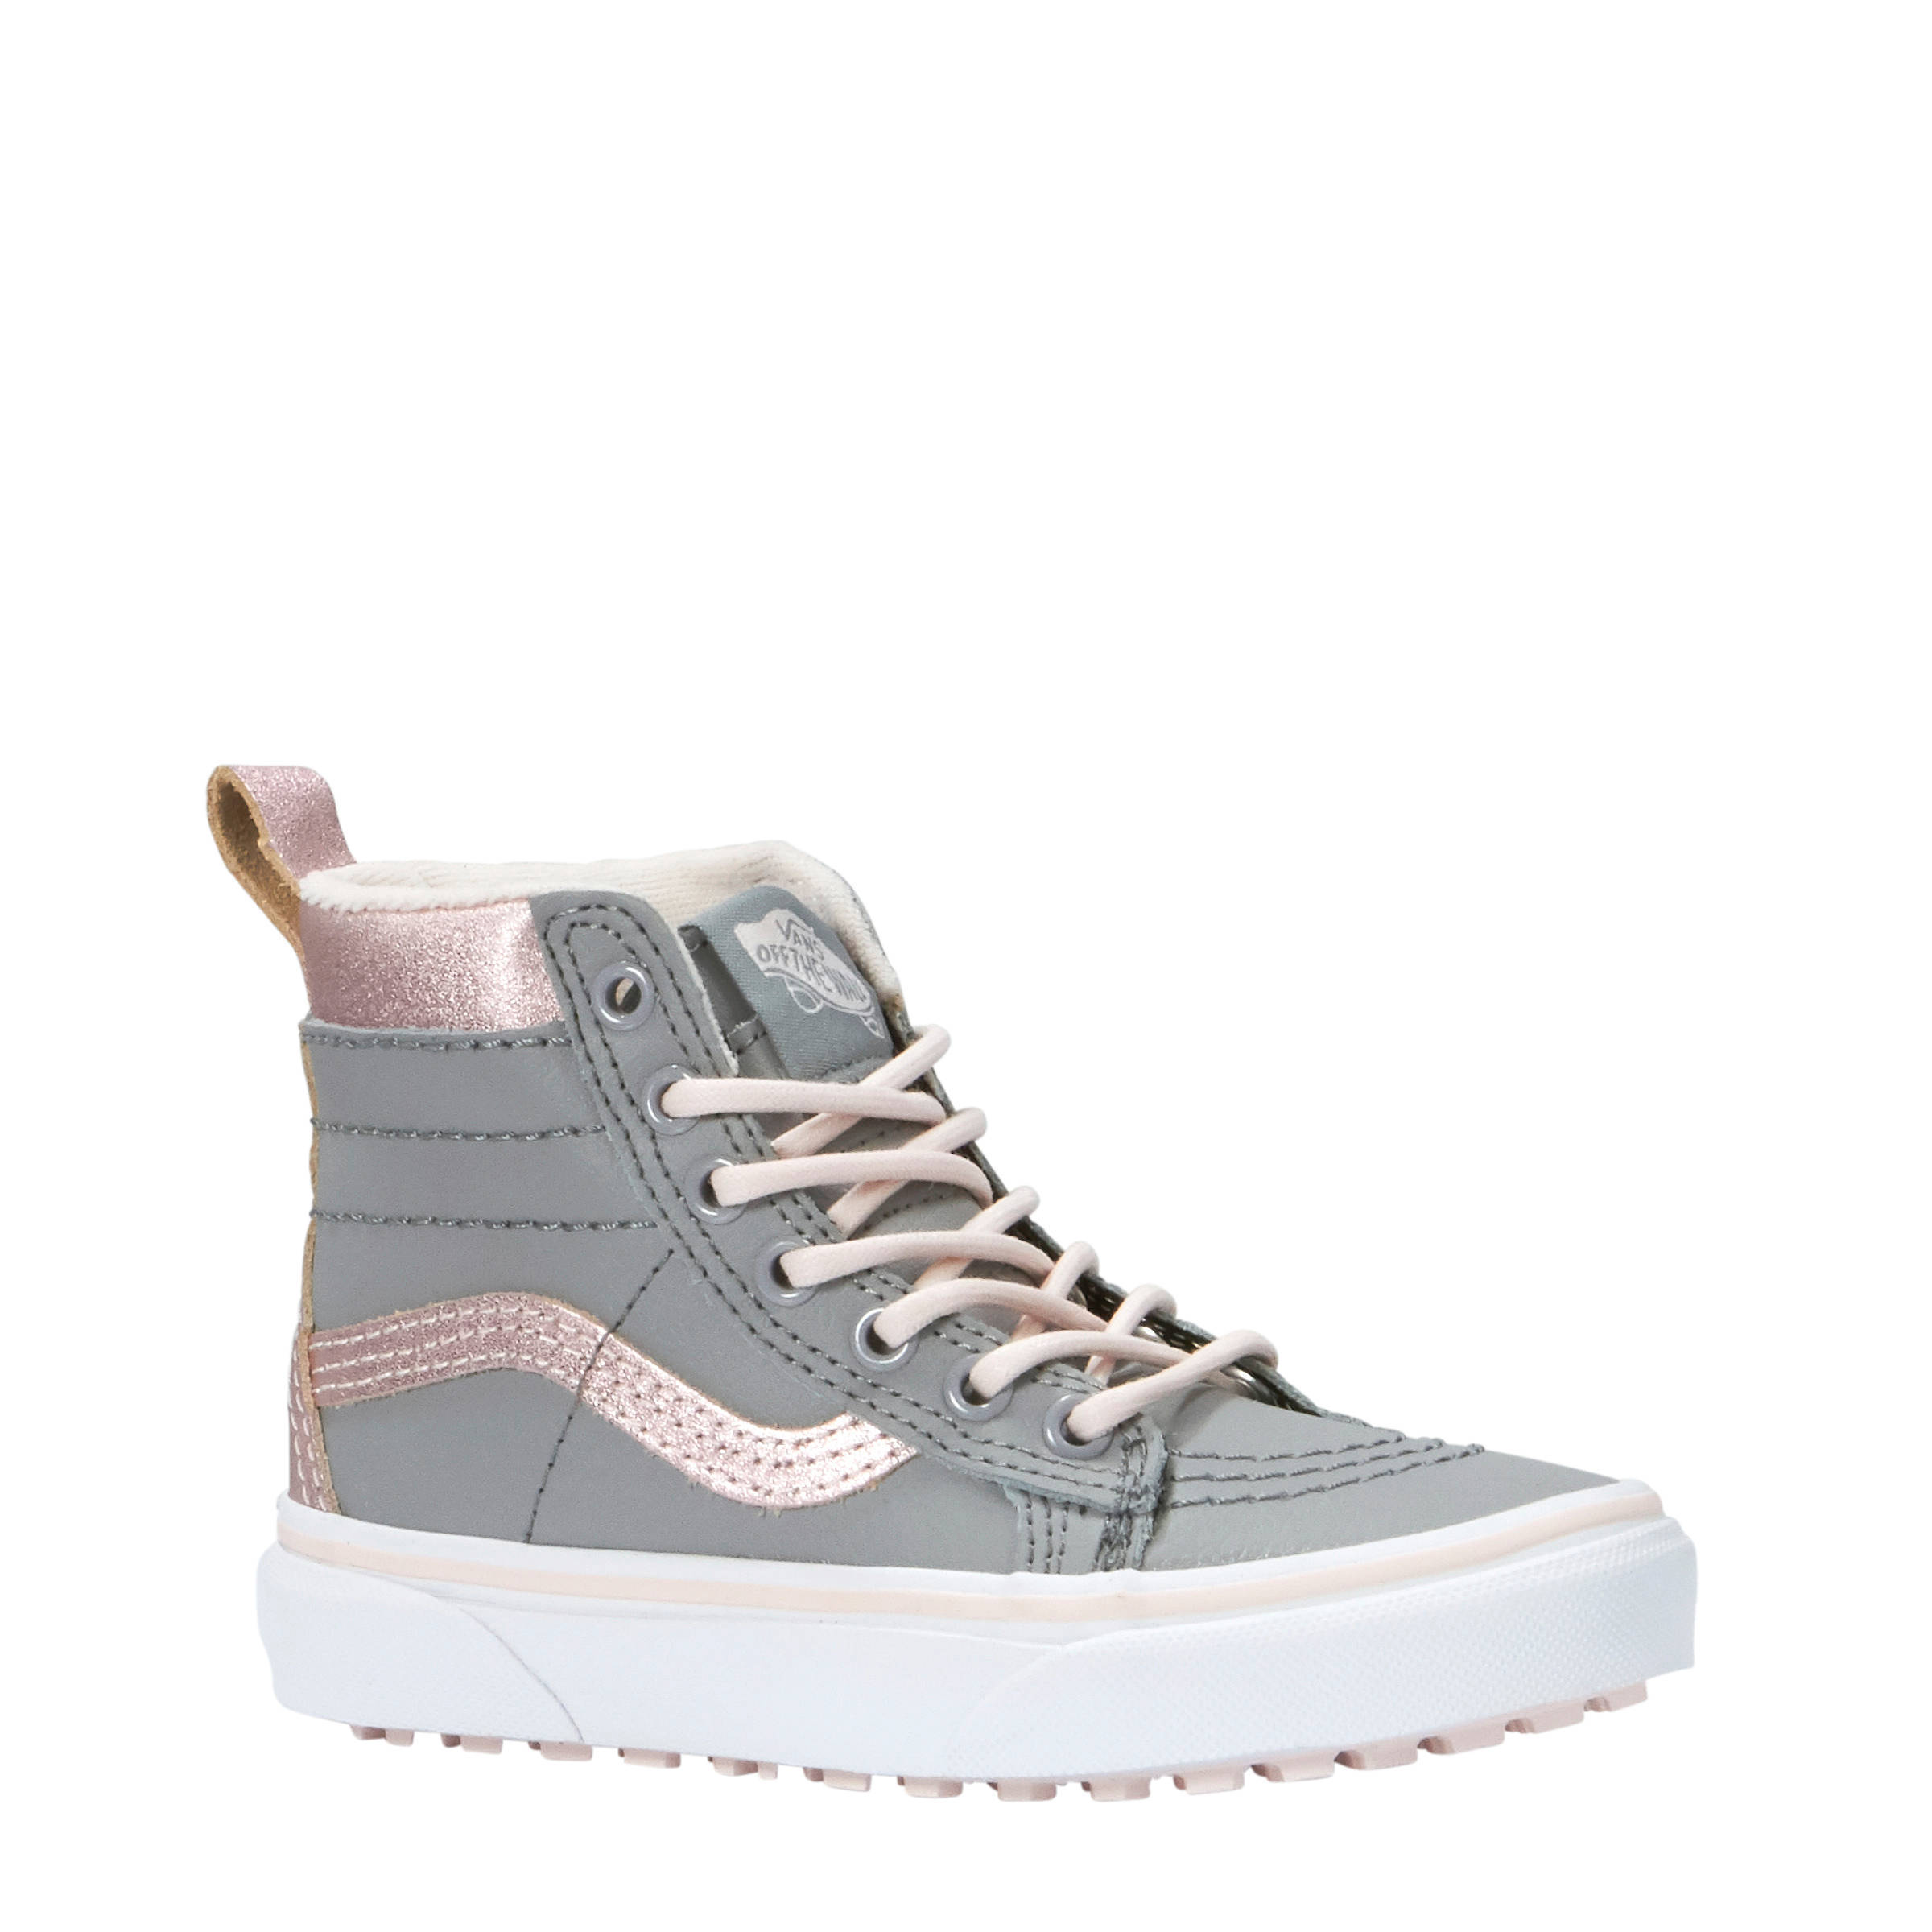 f6e75d612b16ce Vans hi mte leren sneakers wehkamp jpg 966x966 Lil ray mte